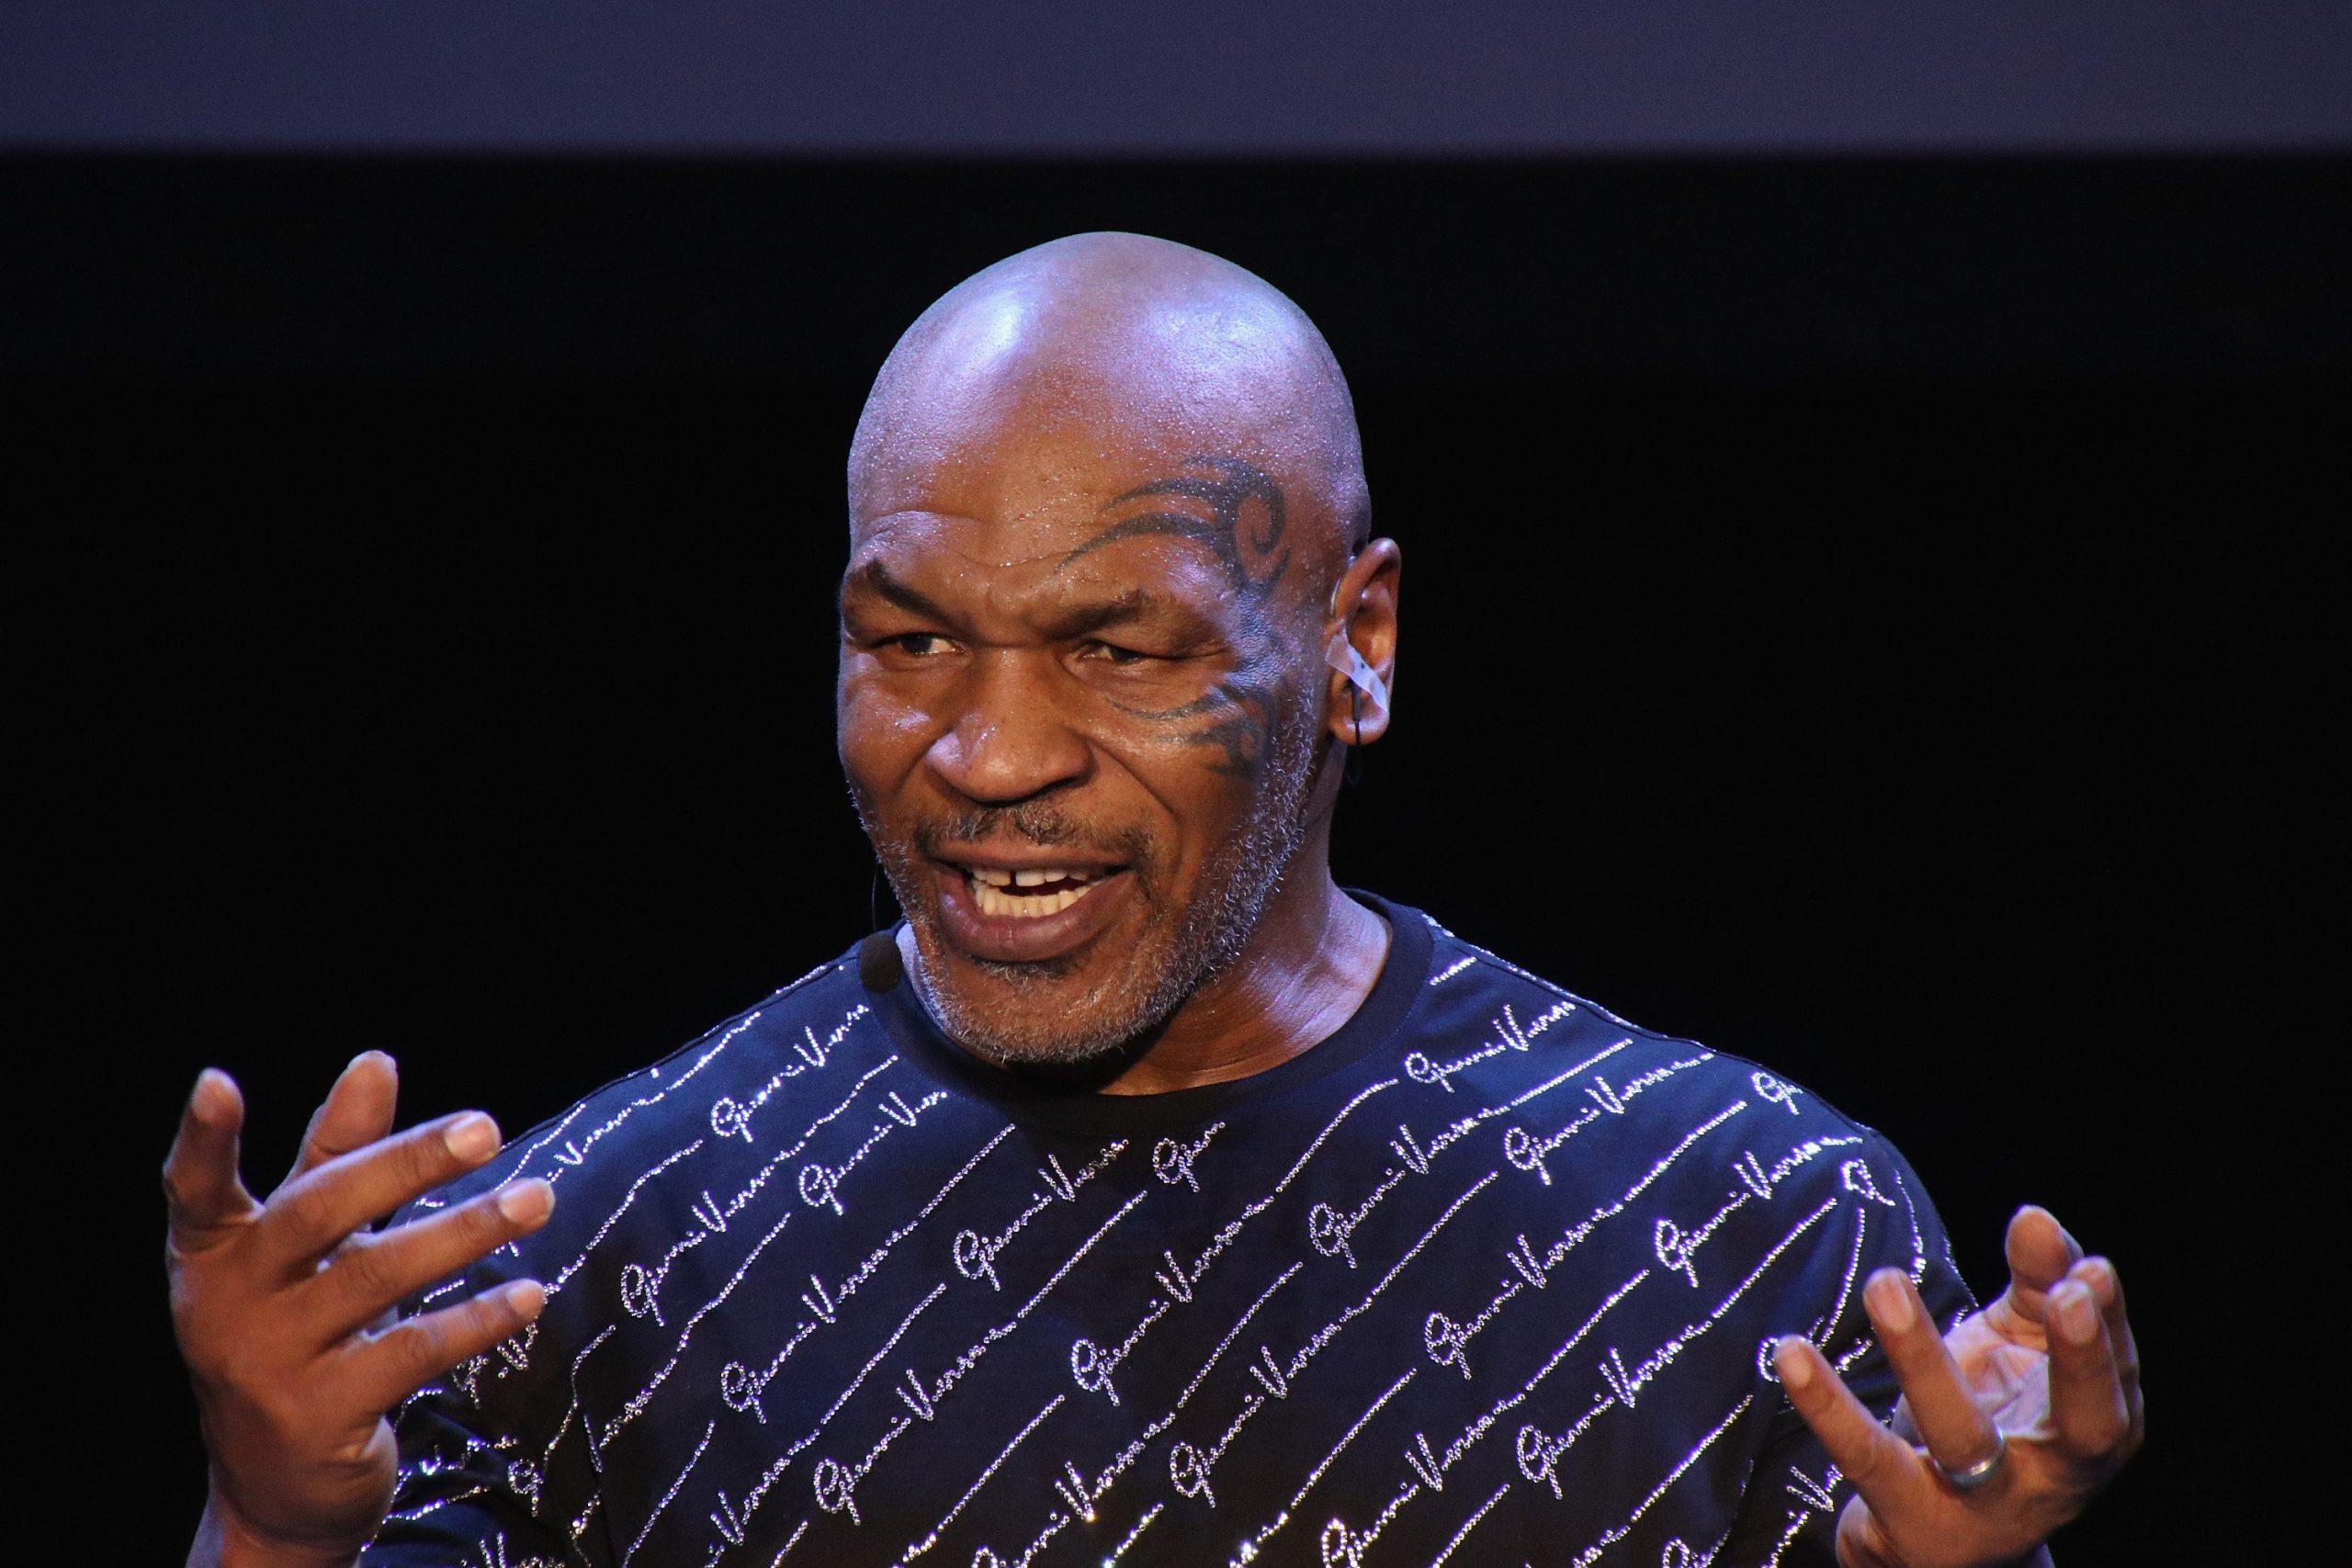 Mike Tyson Fight in Prison